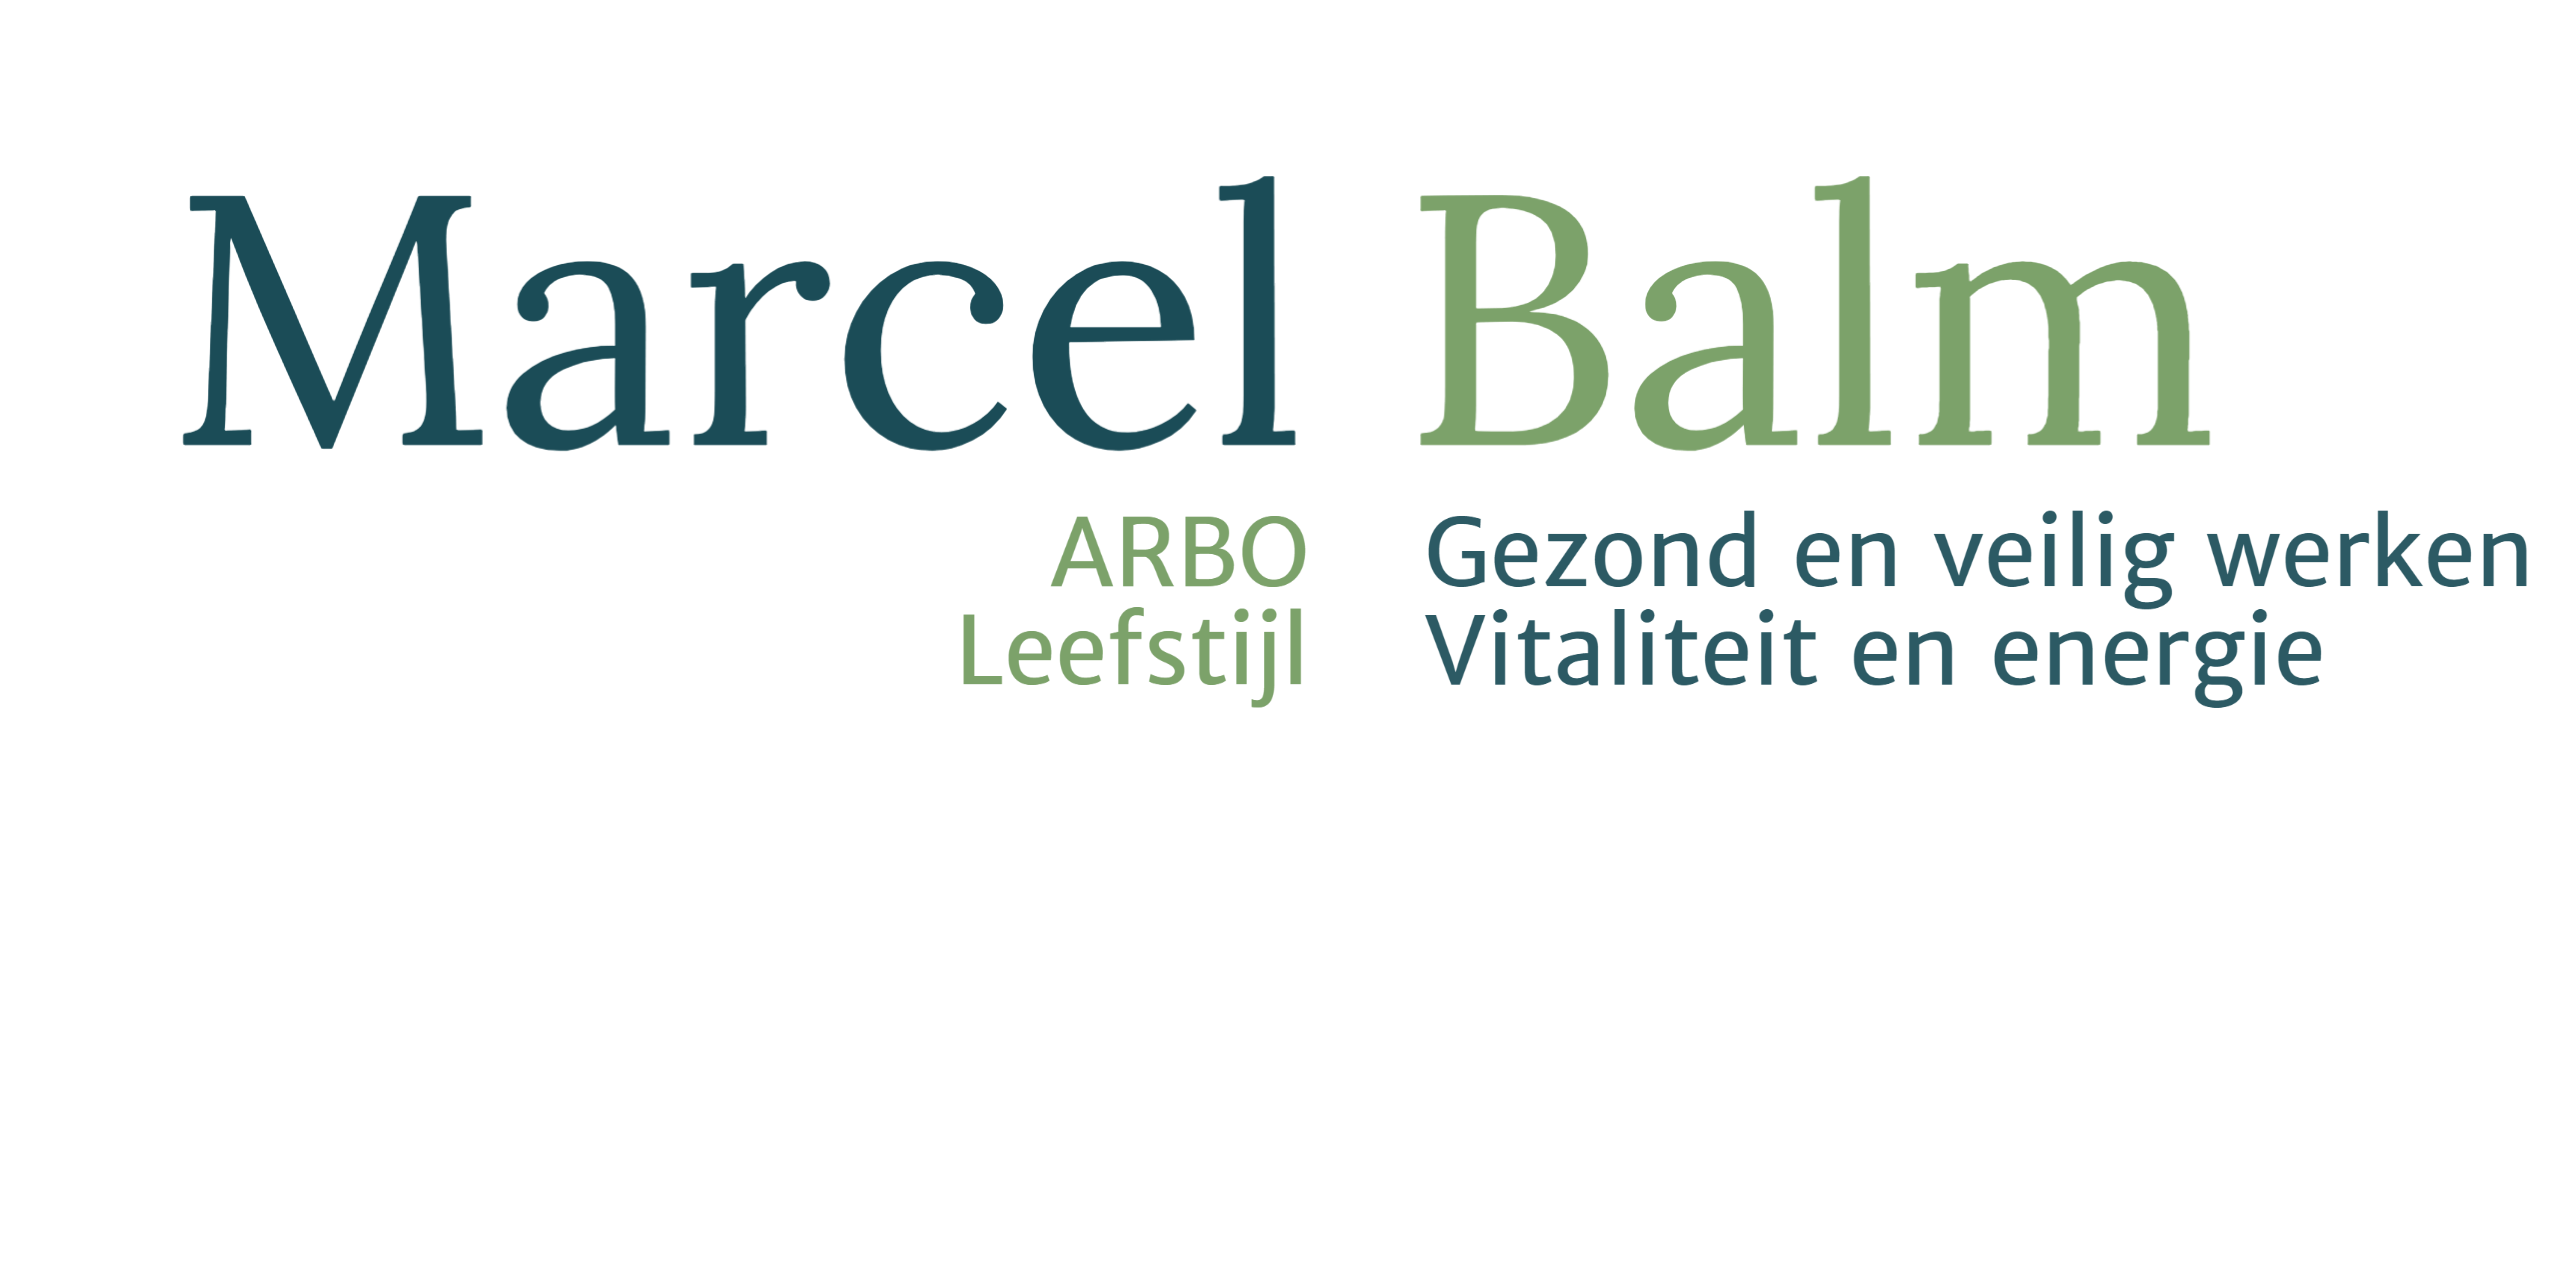 Marcel Balm Logo